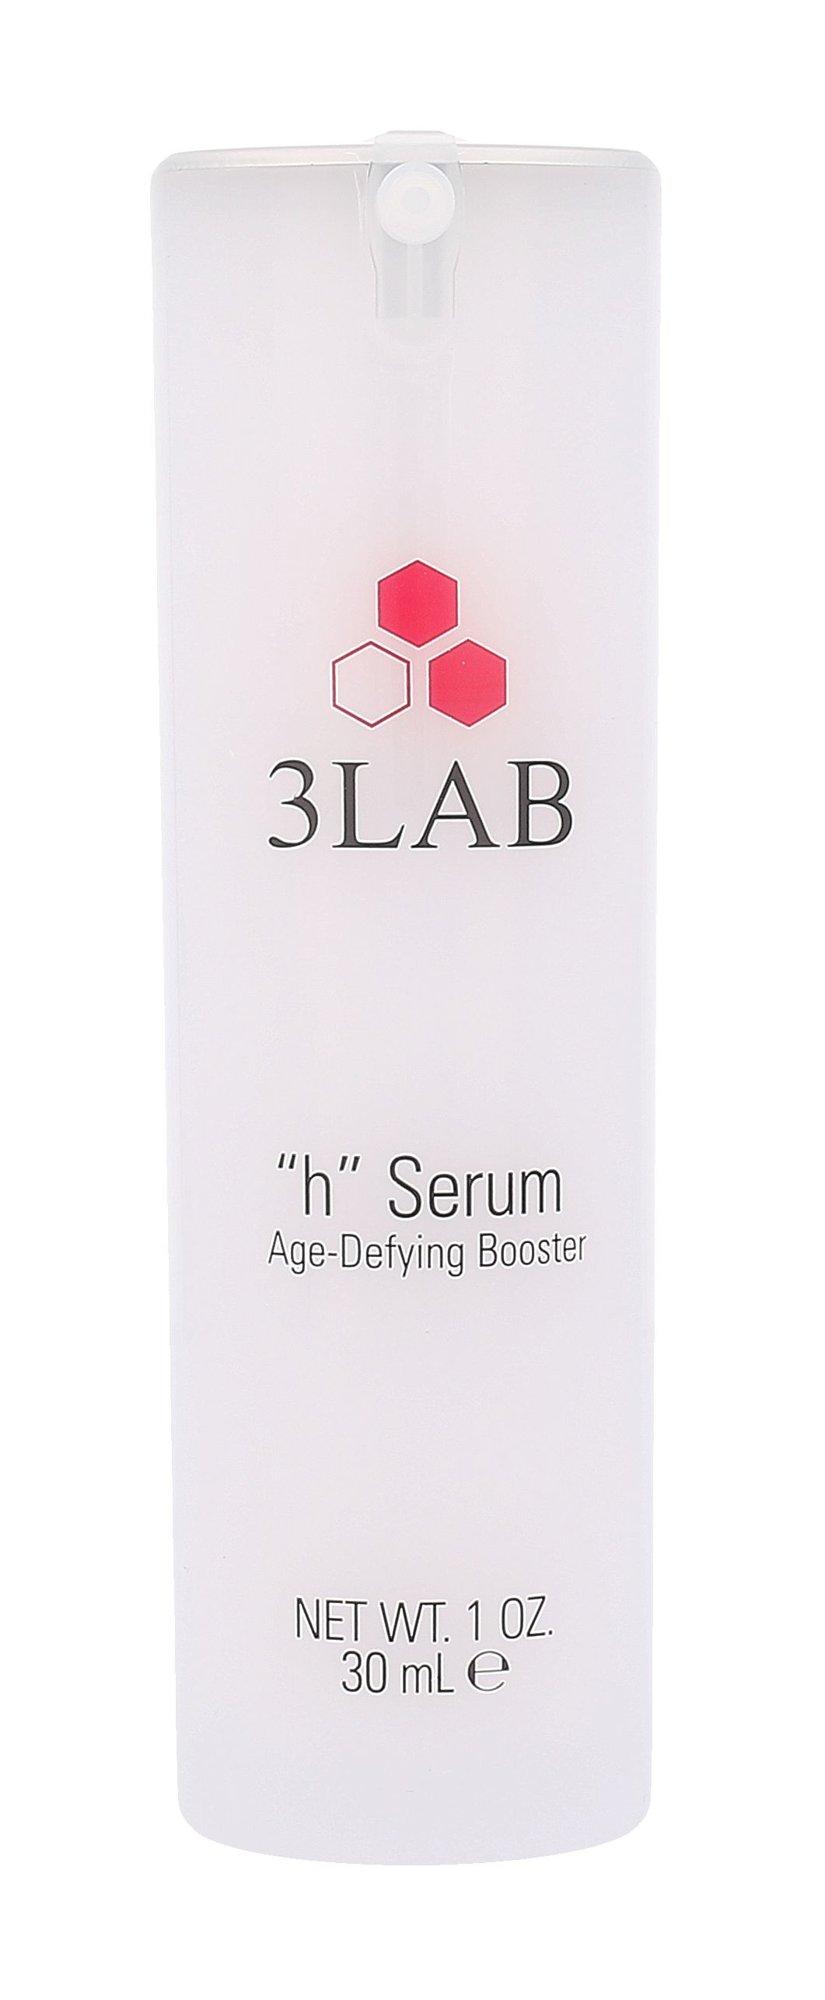 3LAB H Serum Cosmetic 30ml